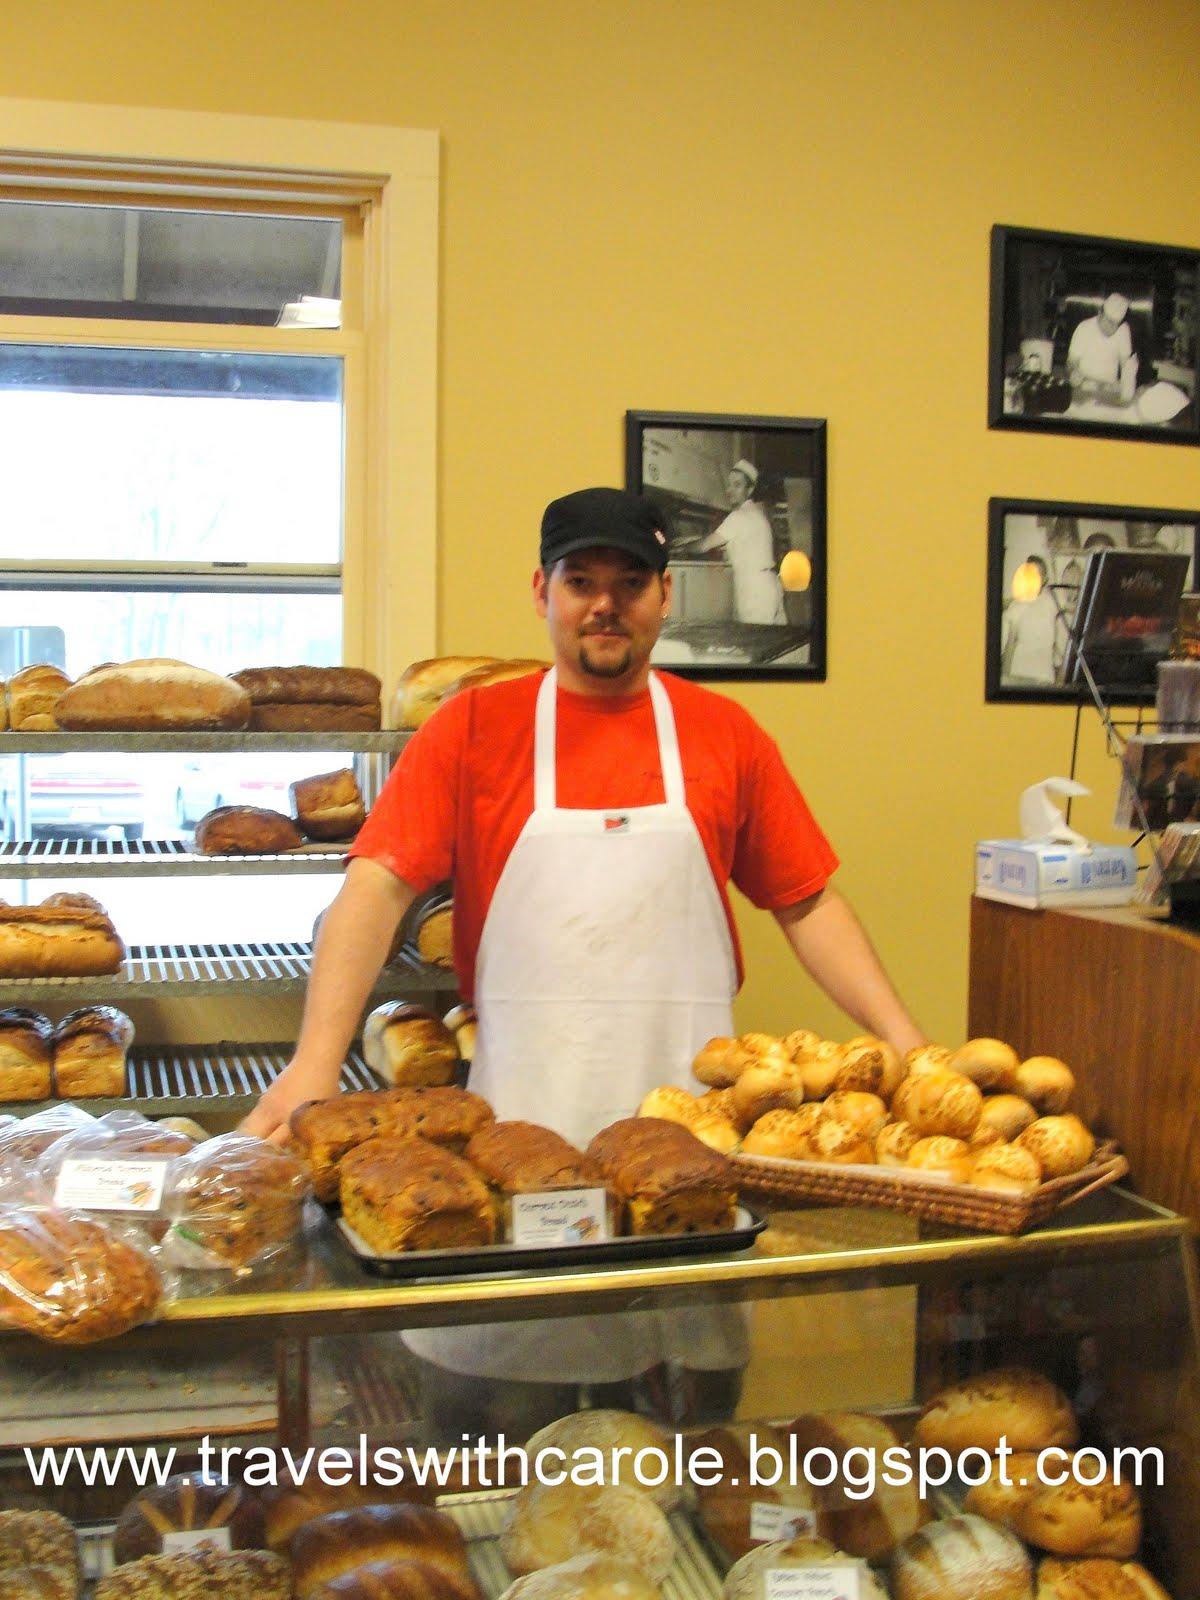 Good Eats: DeBoeru0027s Dutch Brothers Cafe U0026 Bakkerij, Holland, Michigan